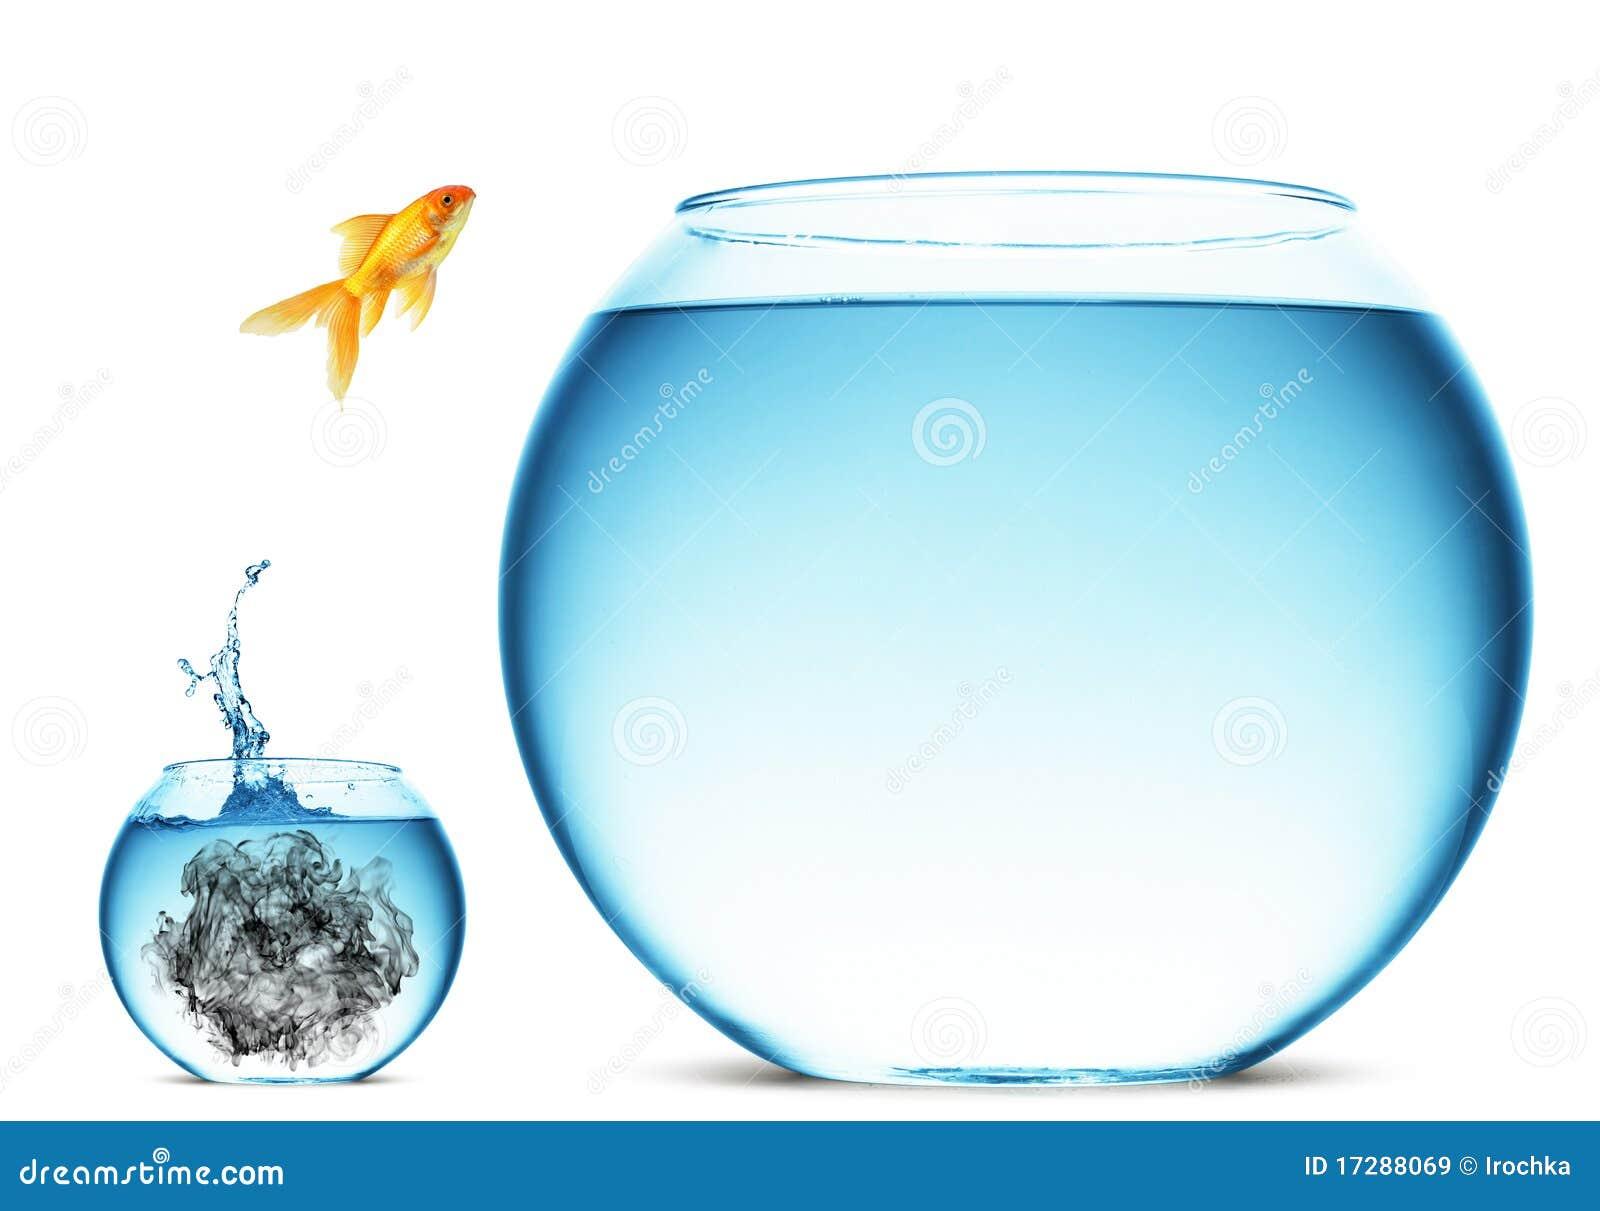 Super Bowl 2015 Goldfish-jumping-large-bowl-17288069